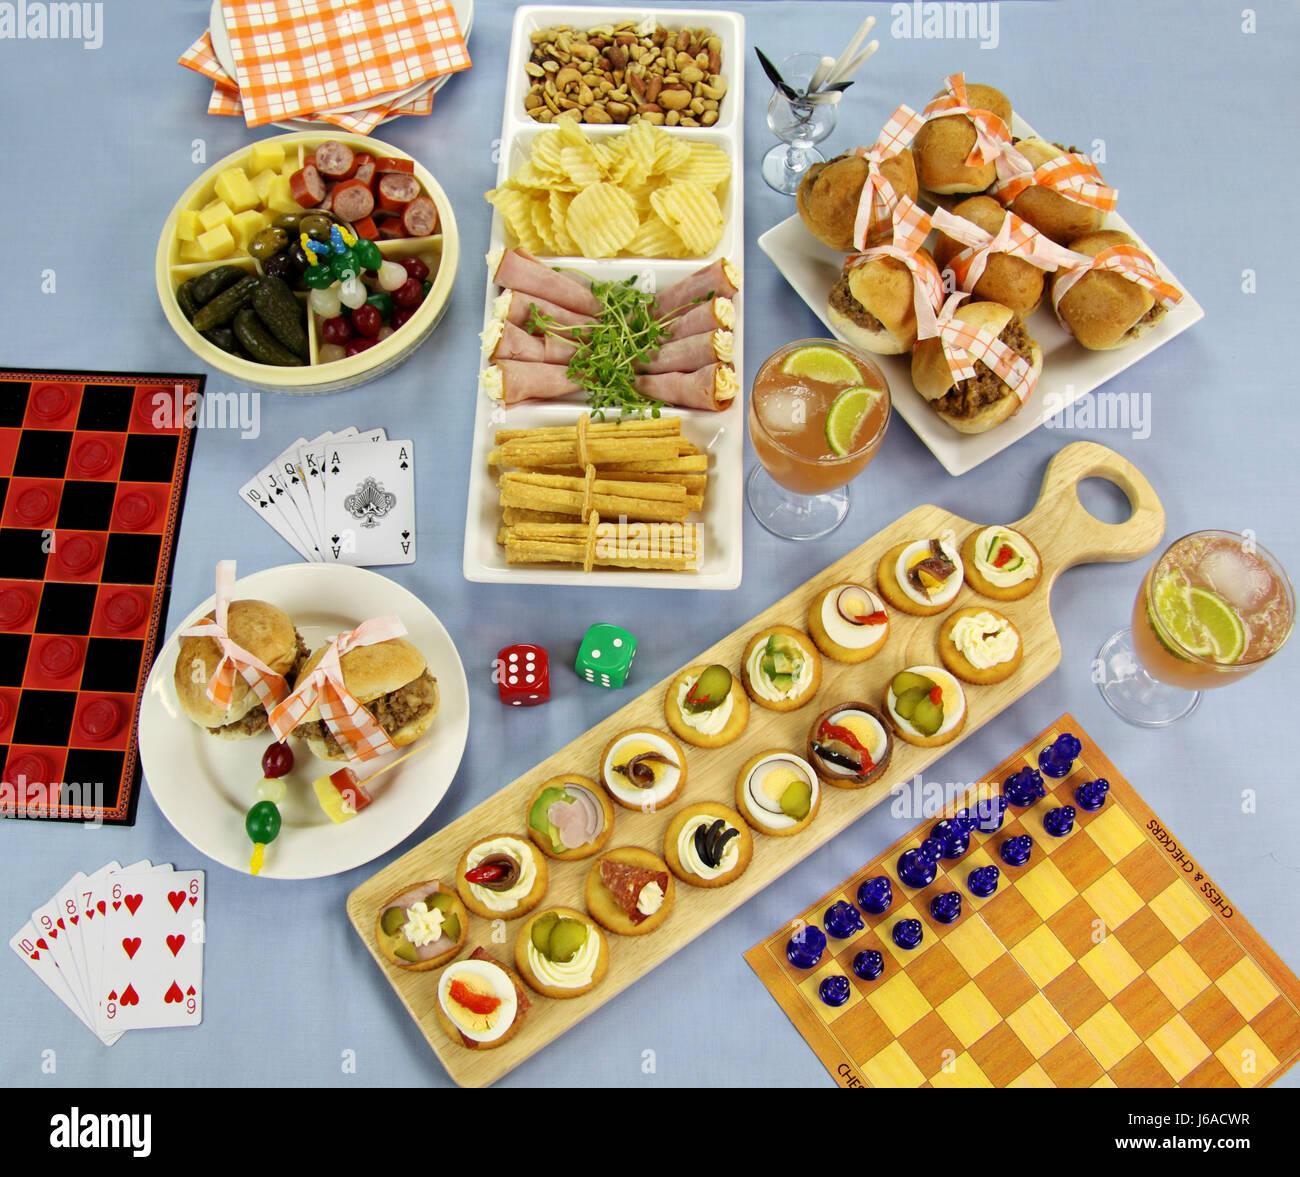 Crisps Potato Sticks Stockfotos & Crisps Potato Sticks Bilder - Alamy